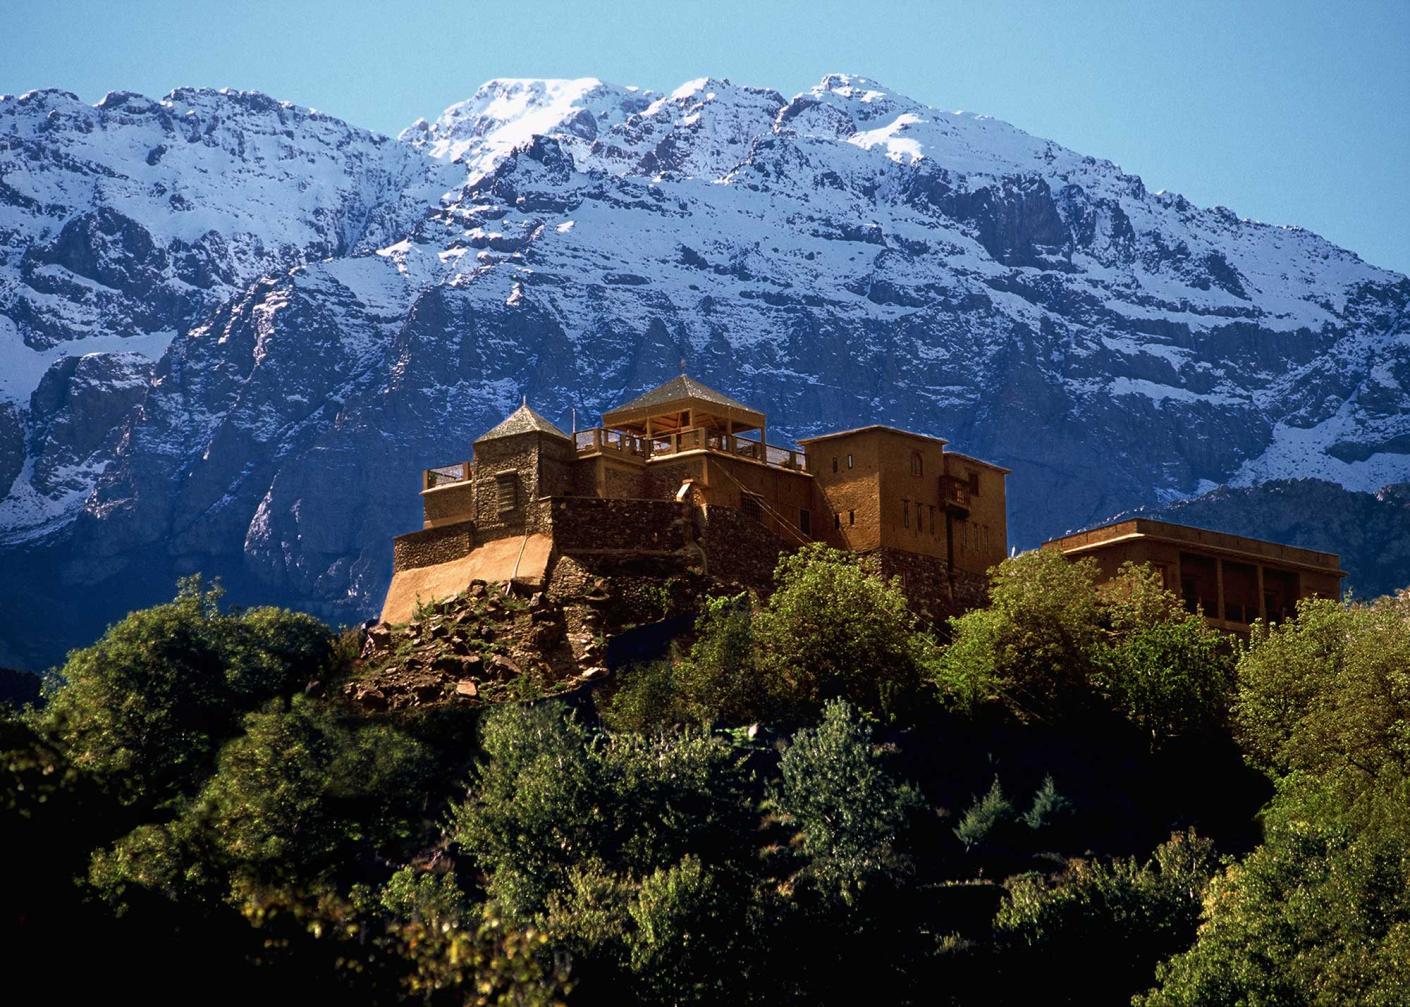 Kasbah Mountain Refuge